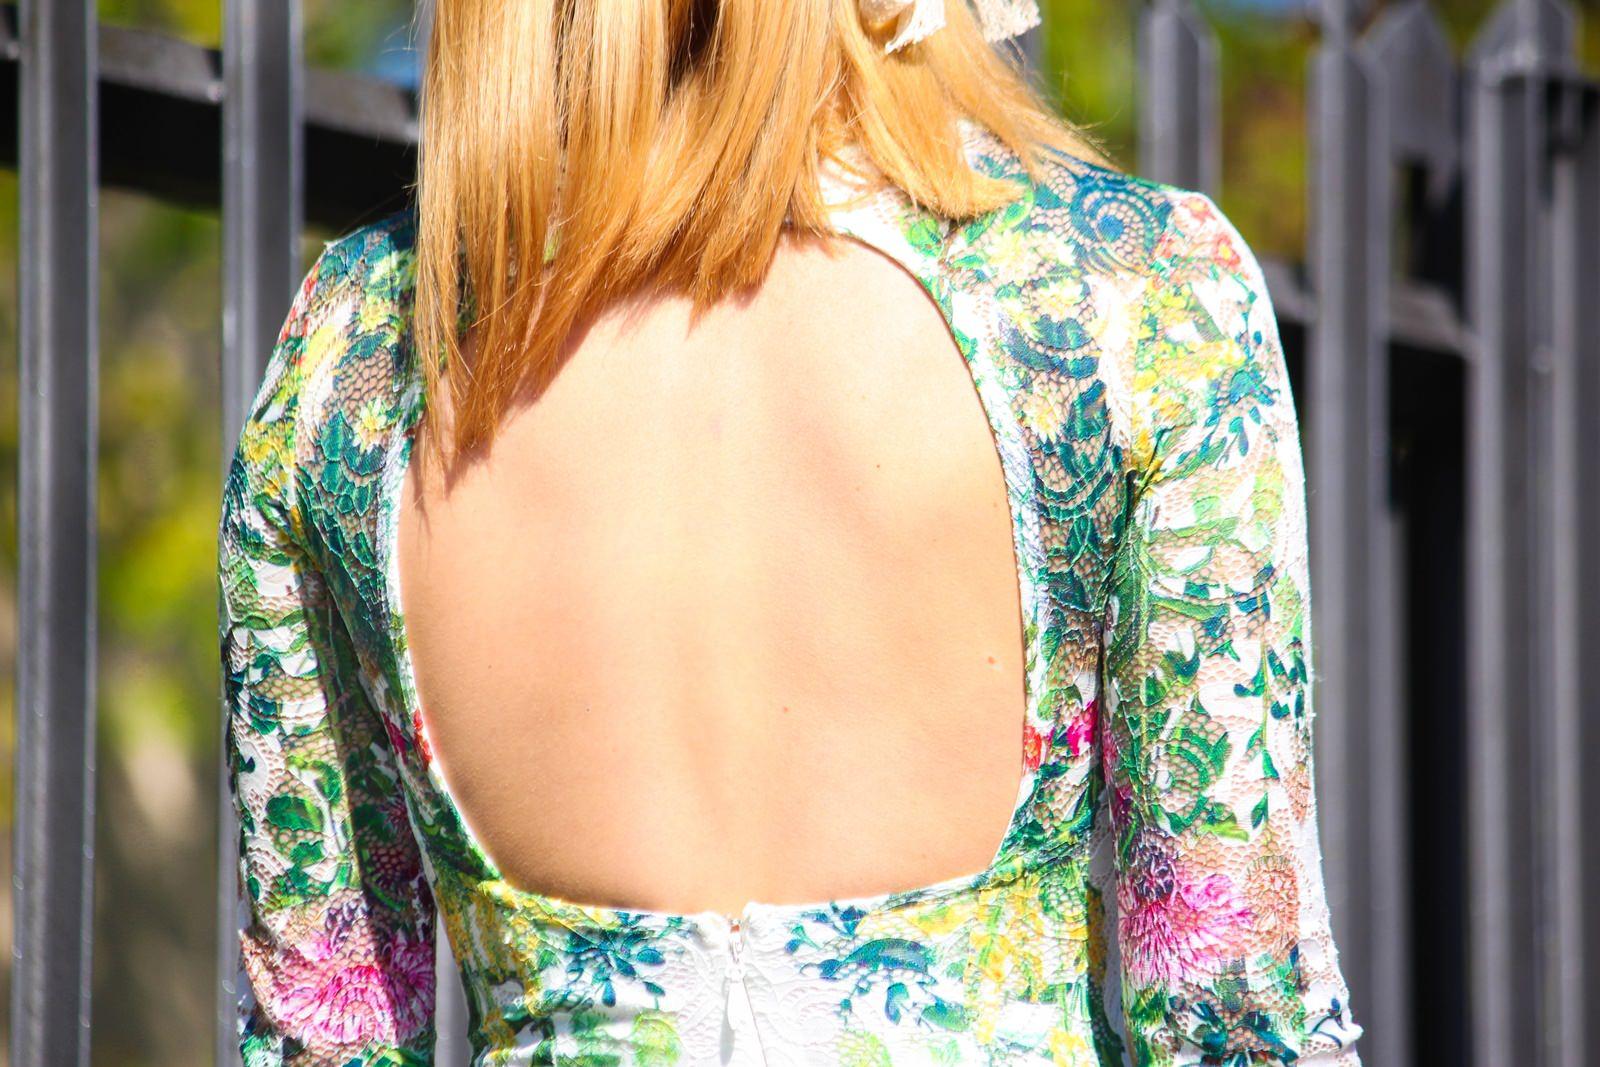 Des Belles Choses_Fashionblog Cologne_Forever 21 Flower Dress 7